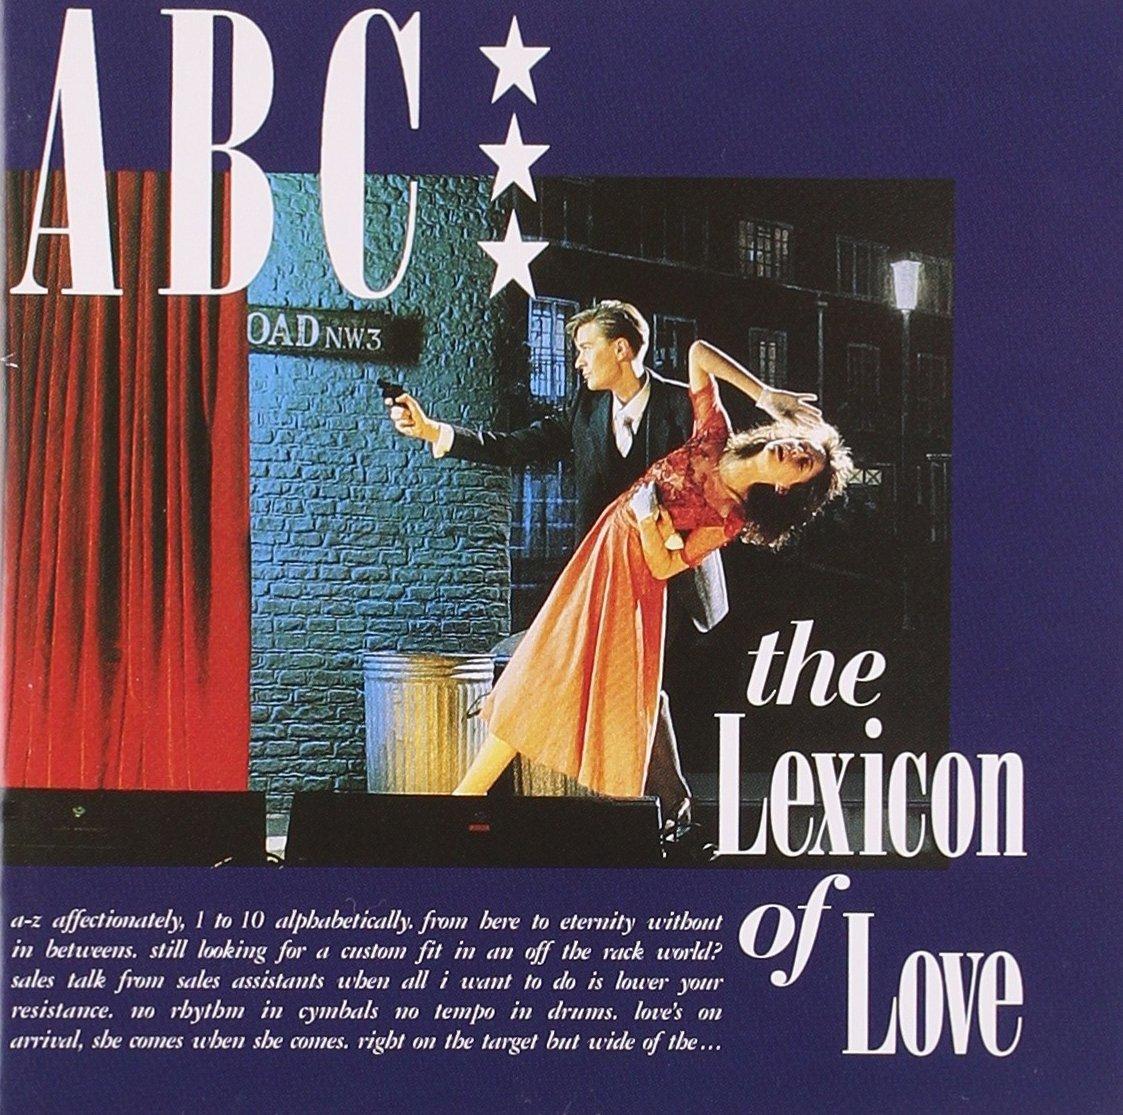 ABC The Lexicon Of Love